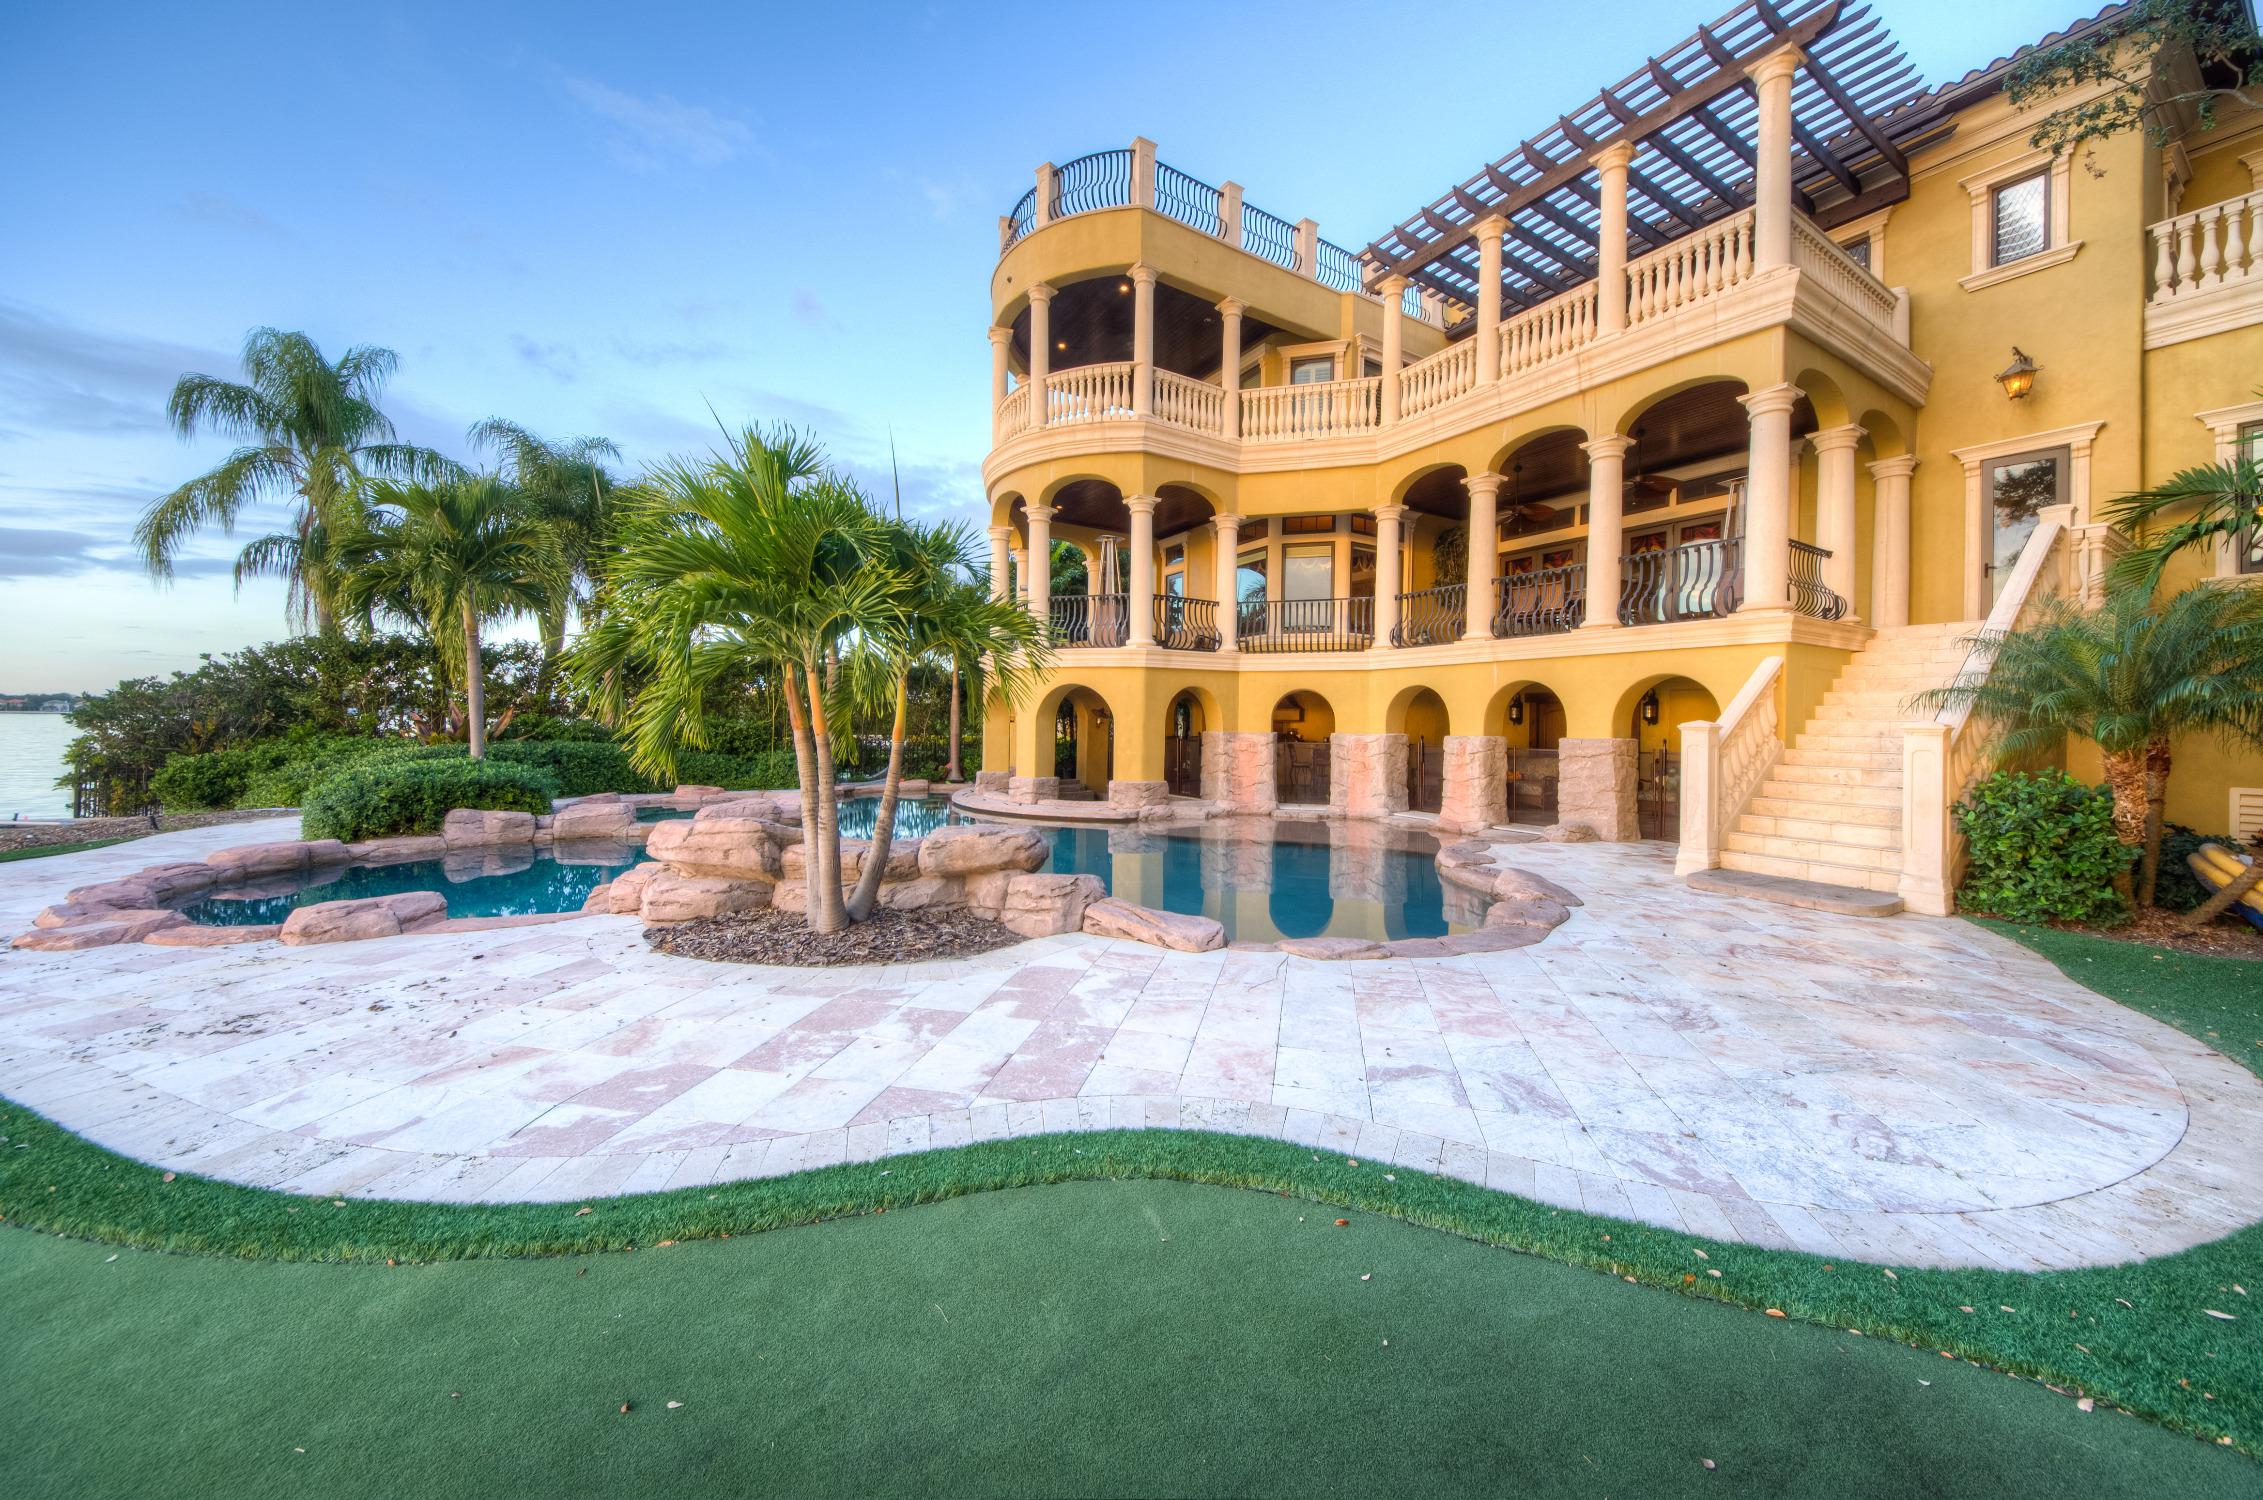 At $4.9M, Davis Islands mansion sale is highest year to date in Hillsborough